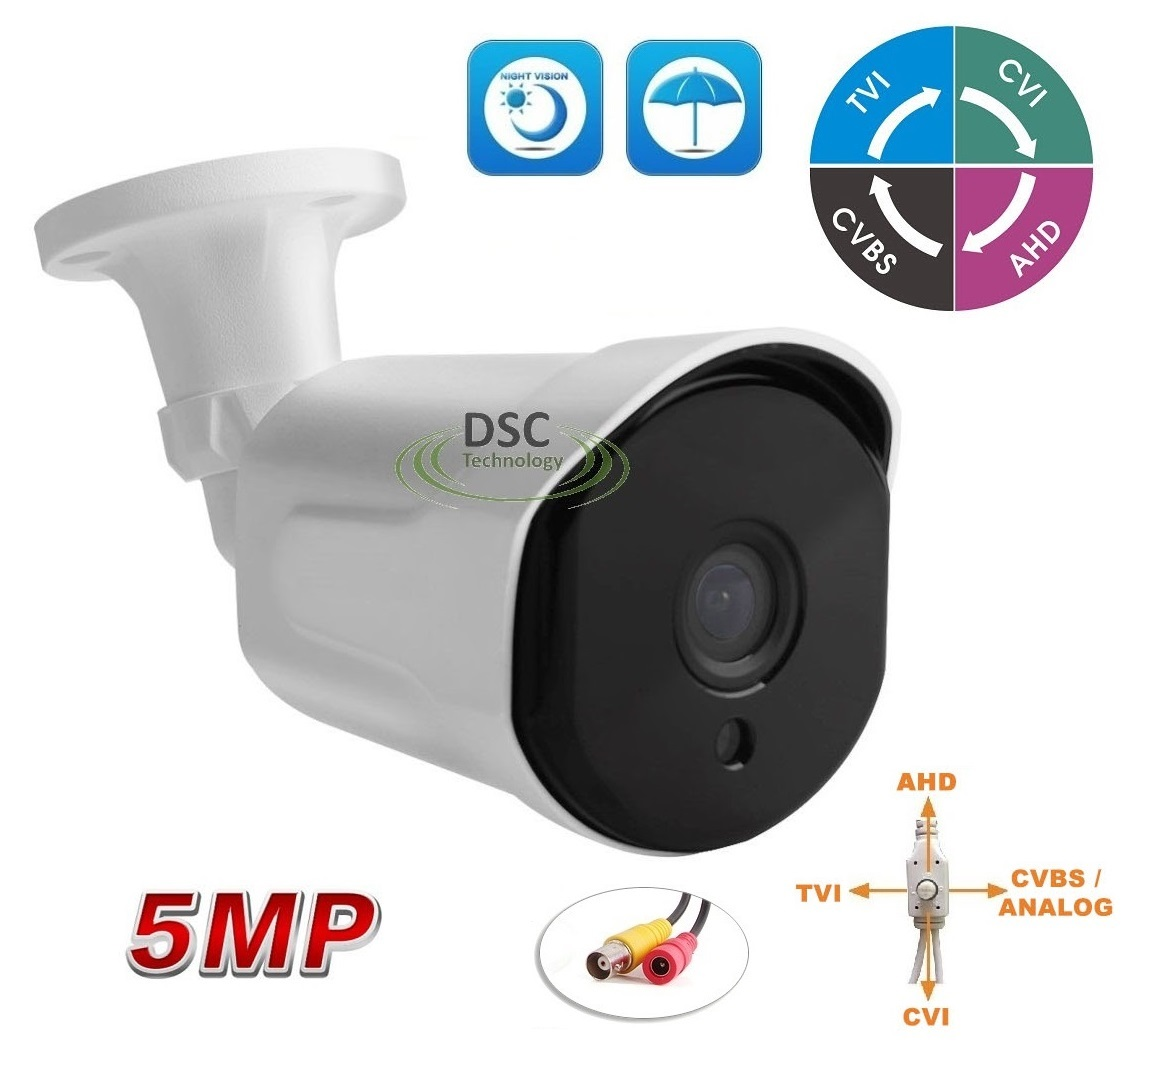 1080P Dome Security Camera 36 IR CCTV High Definition 4in1 TVI CVI AHD ANALOGUE